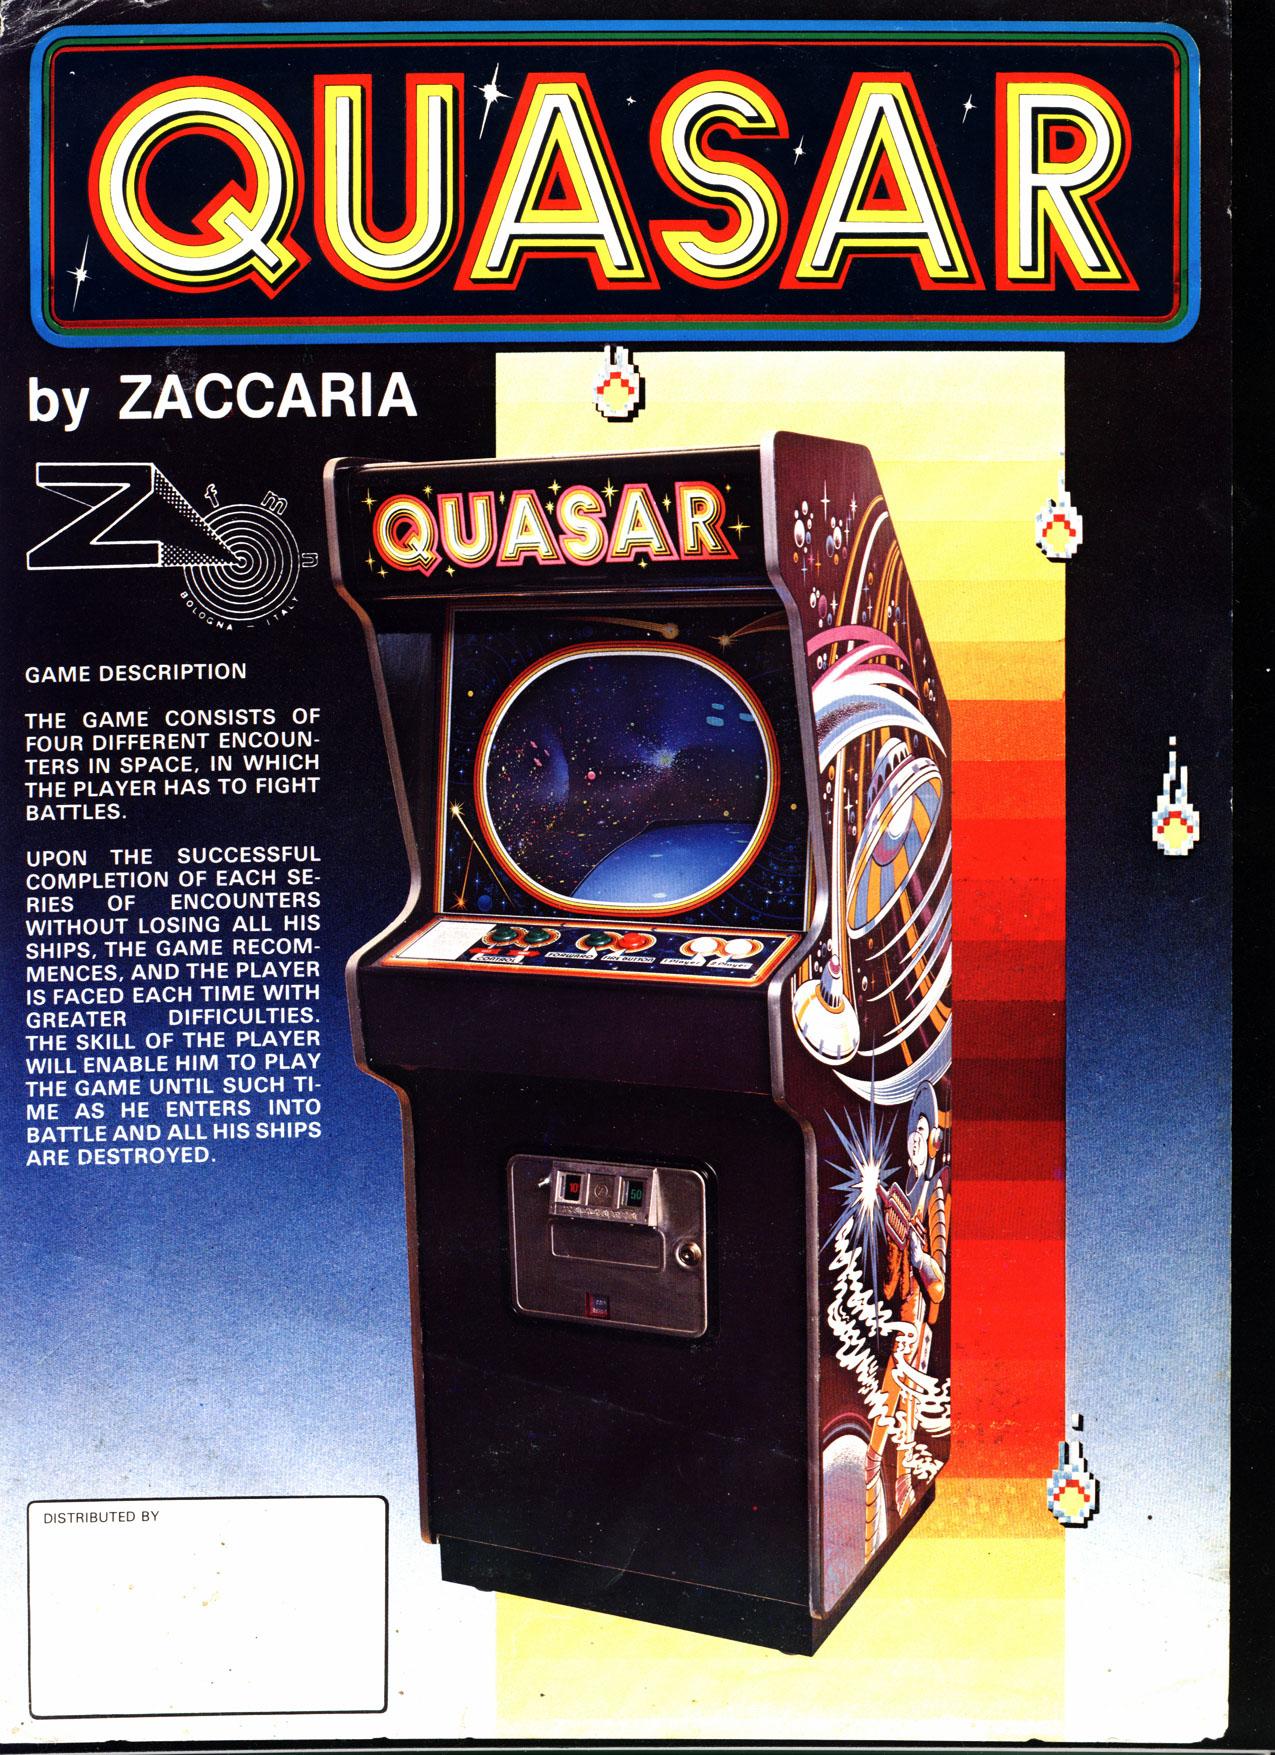 Quasar Game